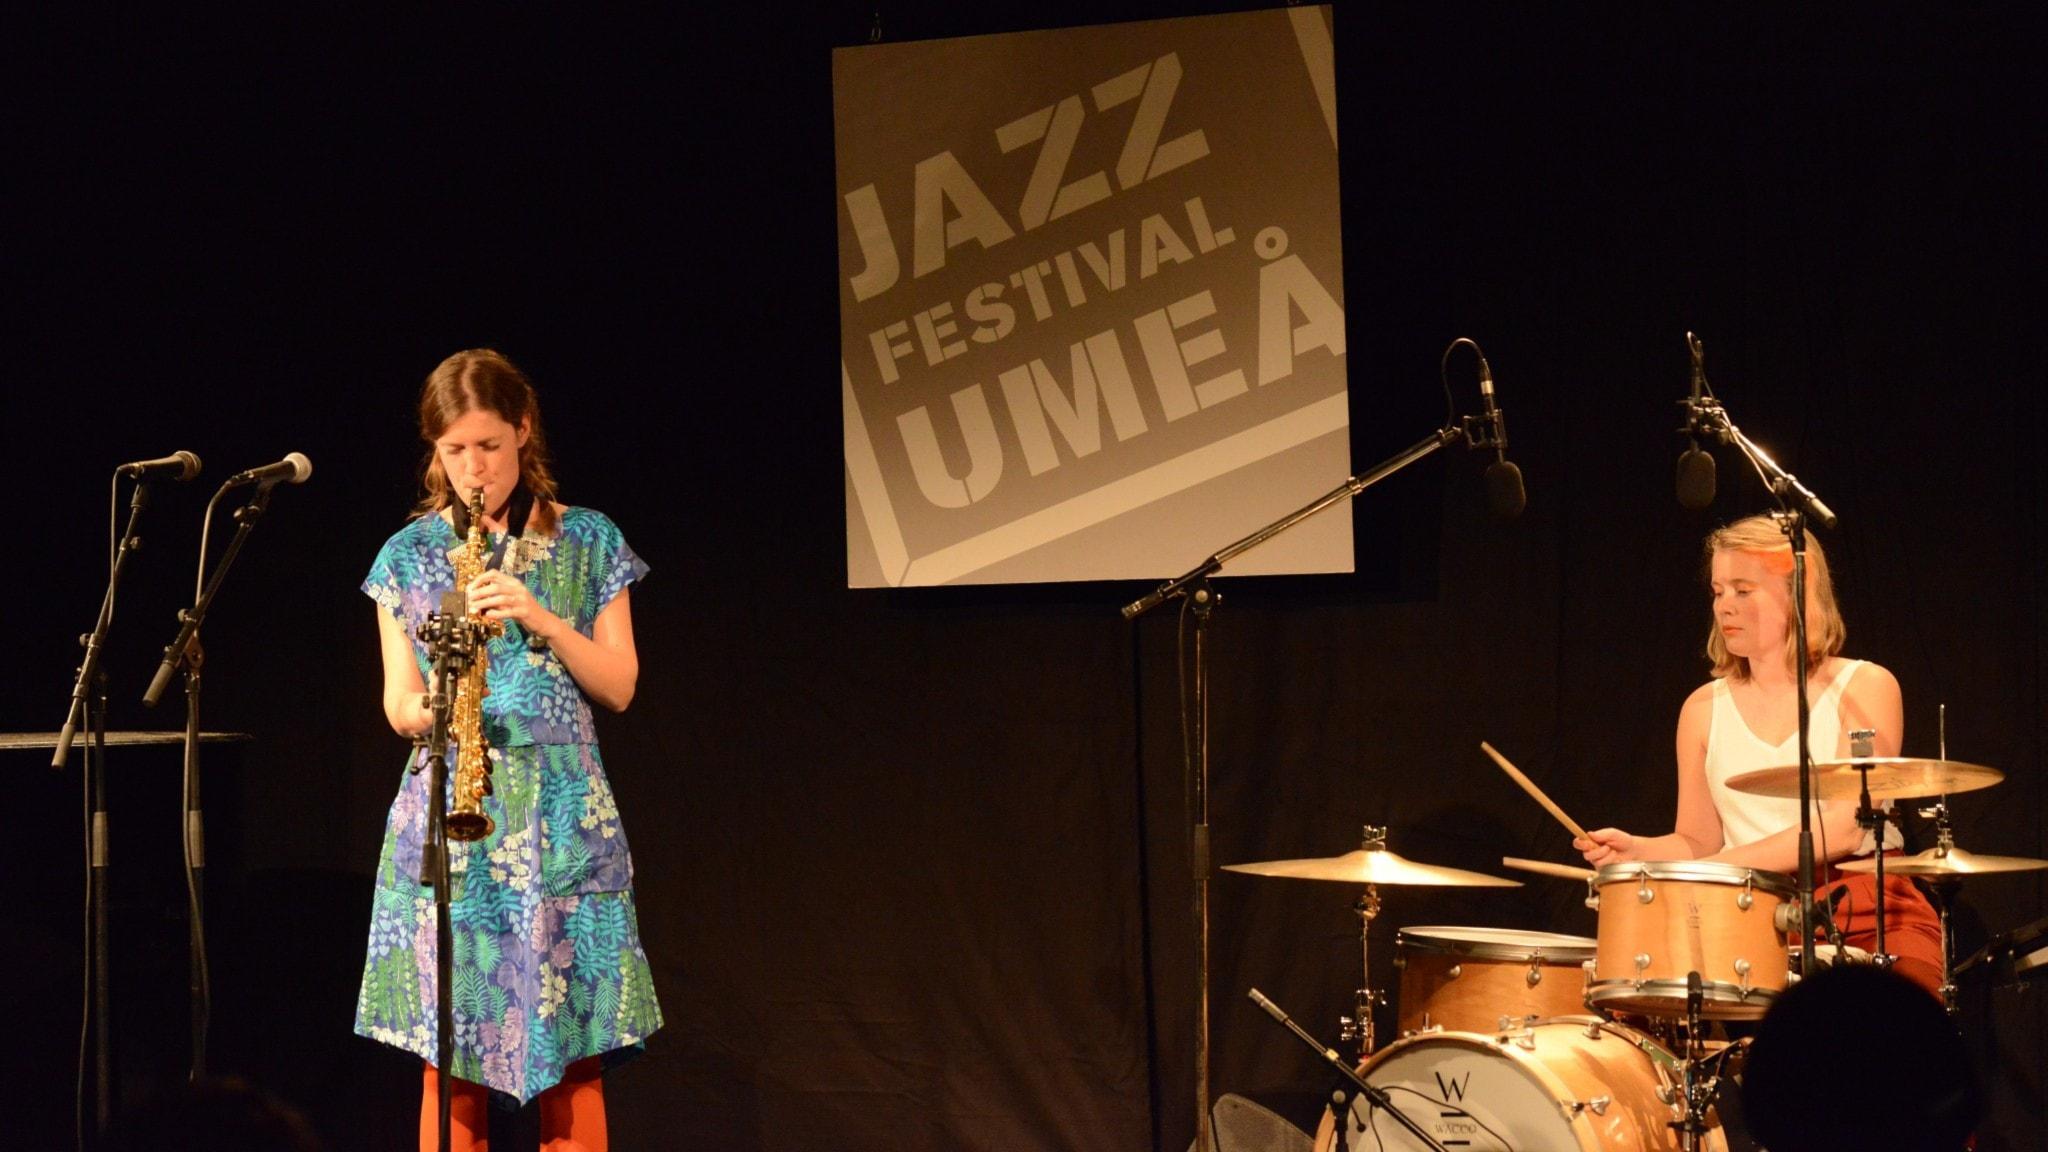 KONSERT: Sisters of Invention på Umeå jazzfestival